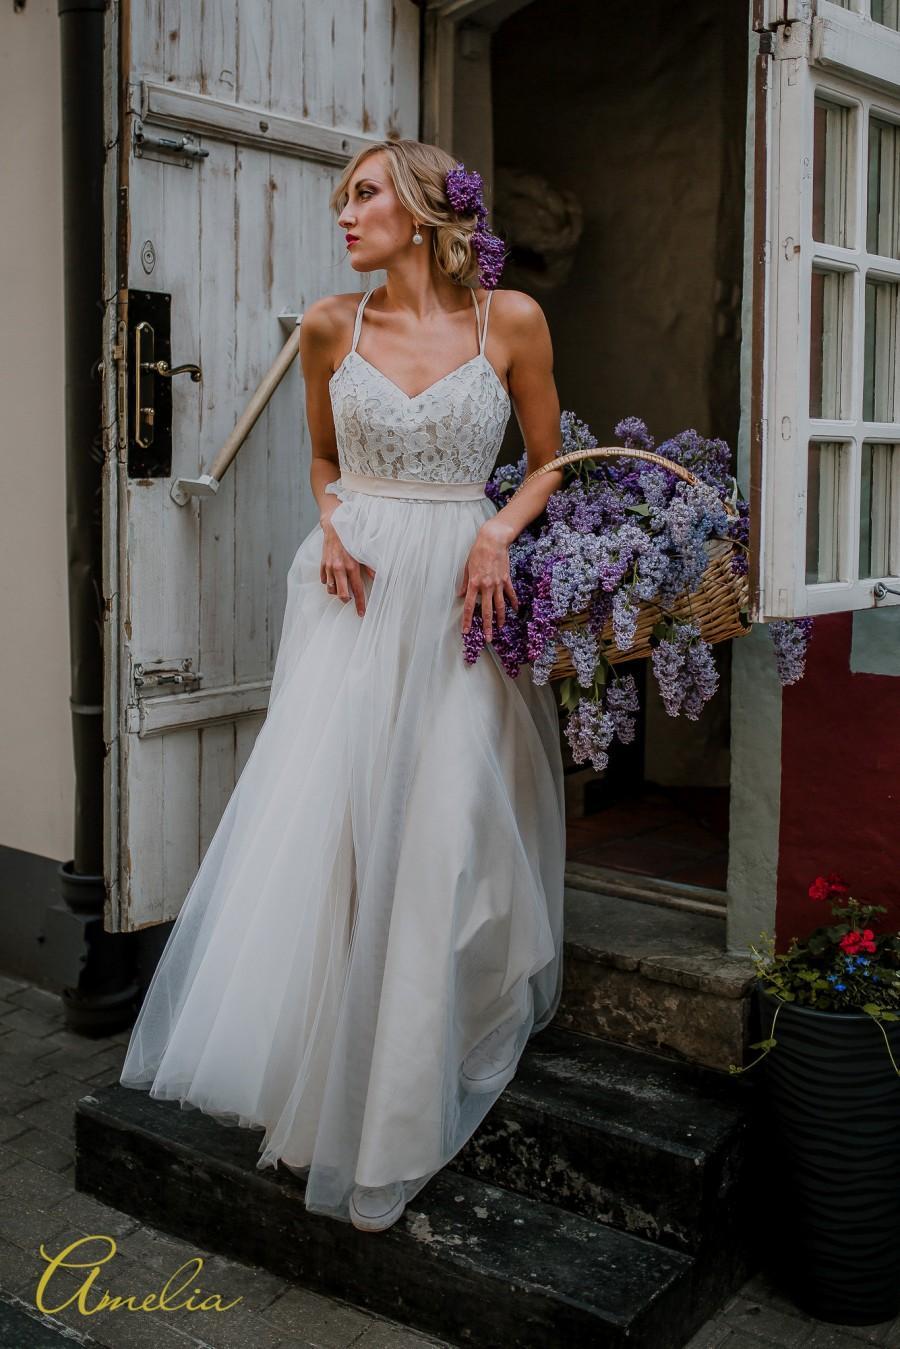 Wedding - Flowy Tulle Beige Wedding Dress/ Bohemian Beige Wedding Dress/ Beige Low Back Wedding Dress/ Bohemian Lace and Tulle Beige Wedding Dress